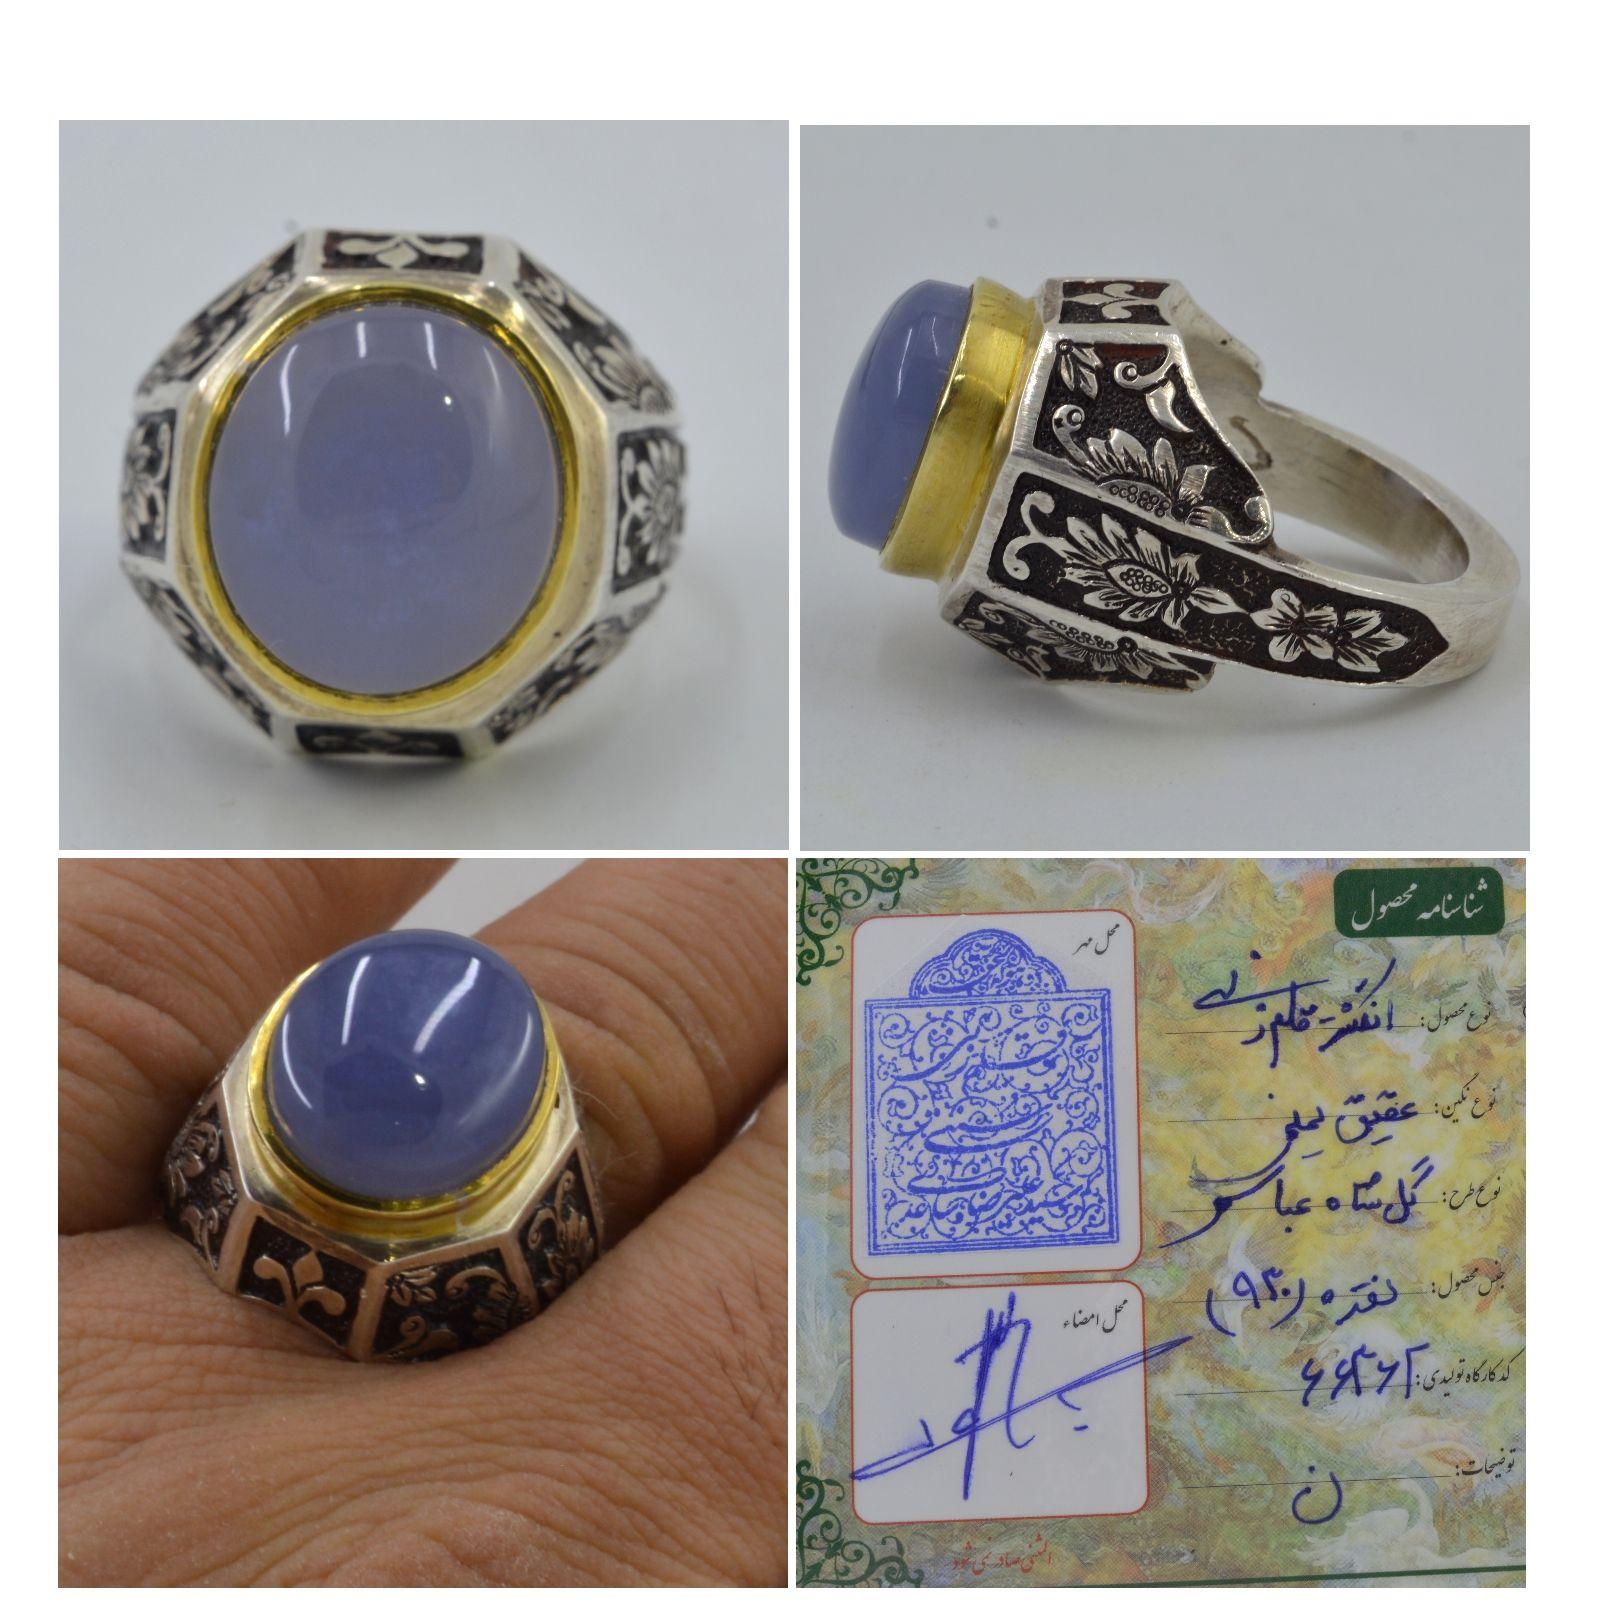 انگشتر نقره مردانه کد s20 -  - 2